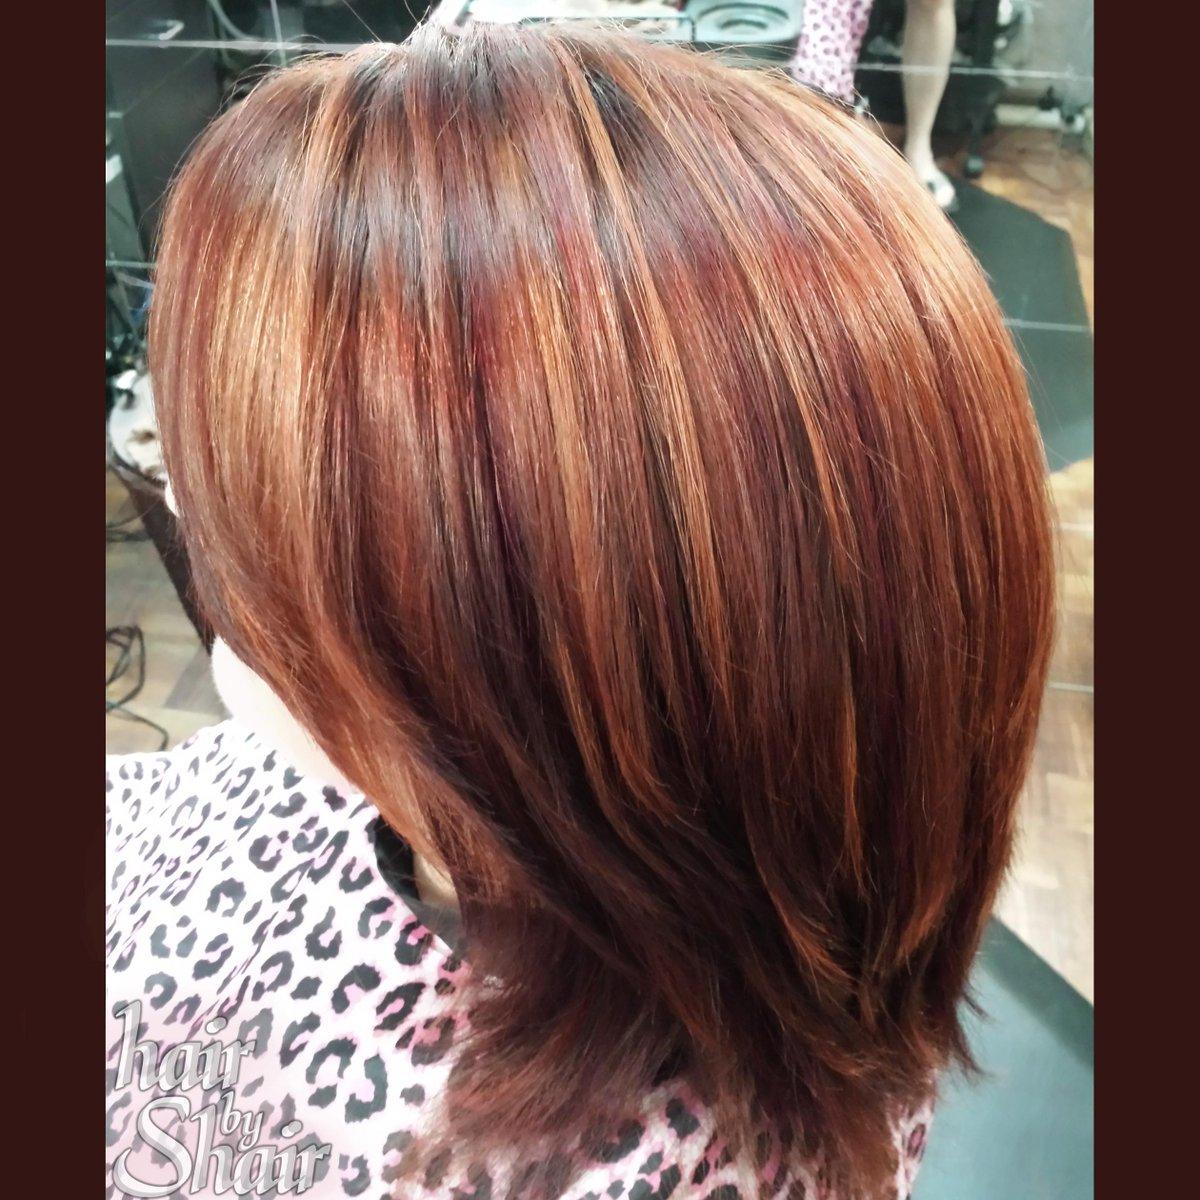 Hair by shair hairbyshair twitter redhair highlights lowlights haircolor matrixfamily modernsalon behindthechair hair shorthairpicitteru6bugw6t3p pmusecretfo Gallery